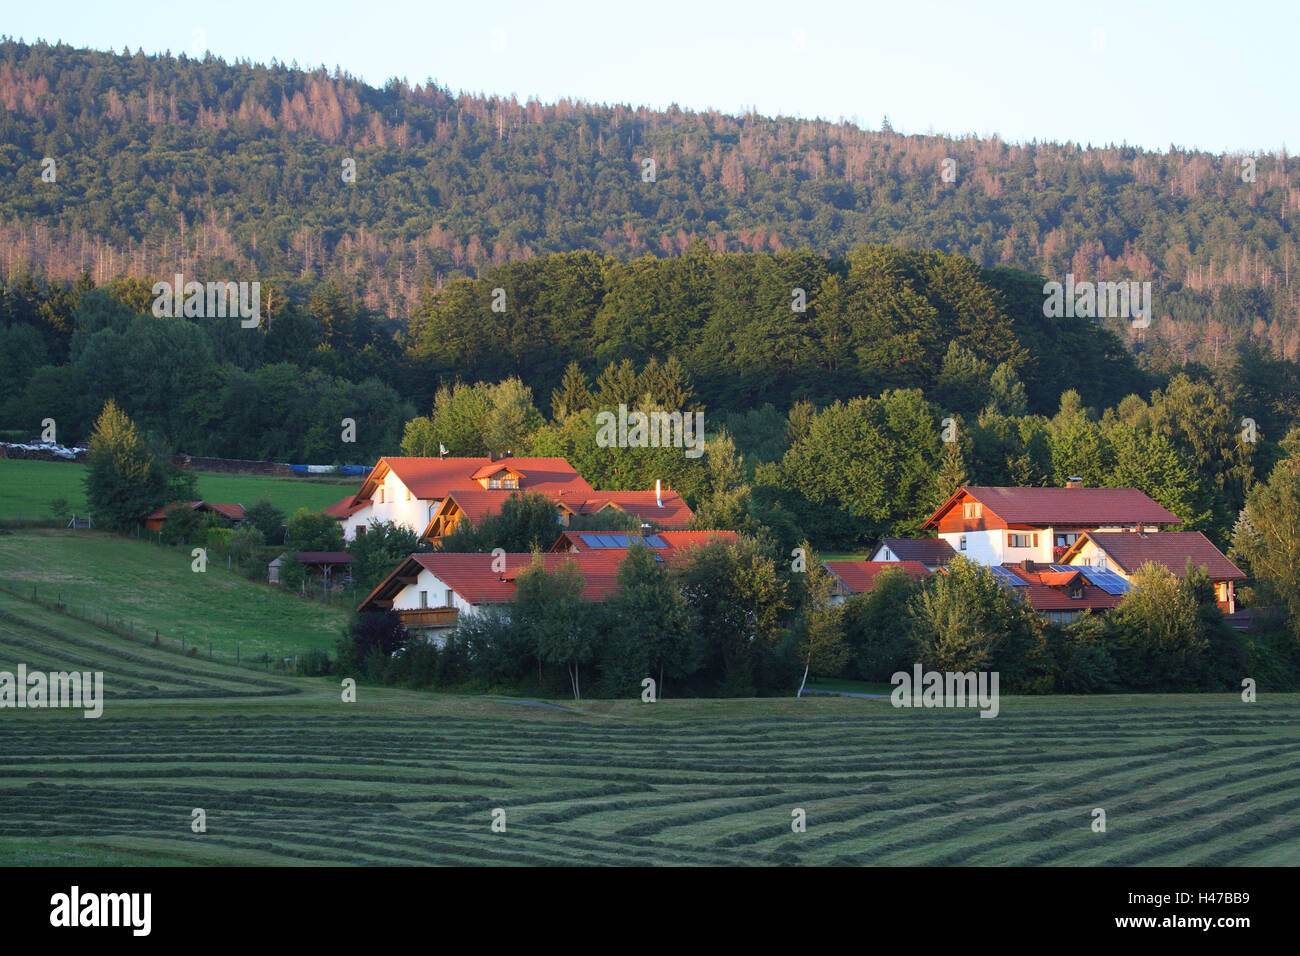 Village, Idyll, Altschönau, the Bavarian Forest, Germany, - Stock Image